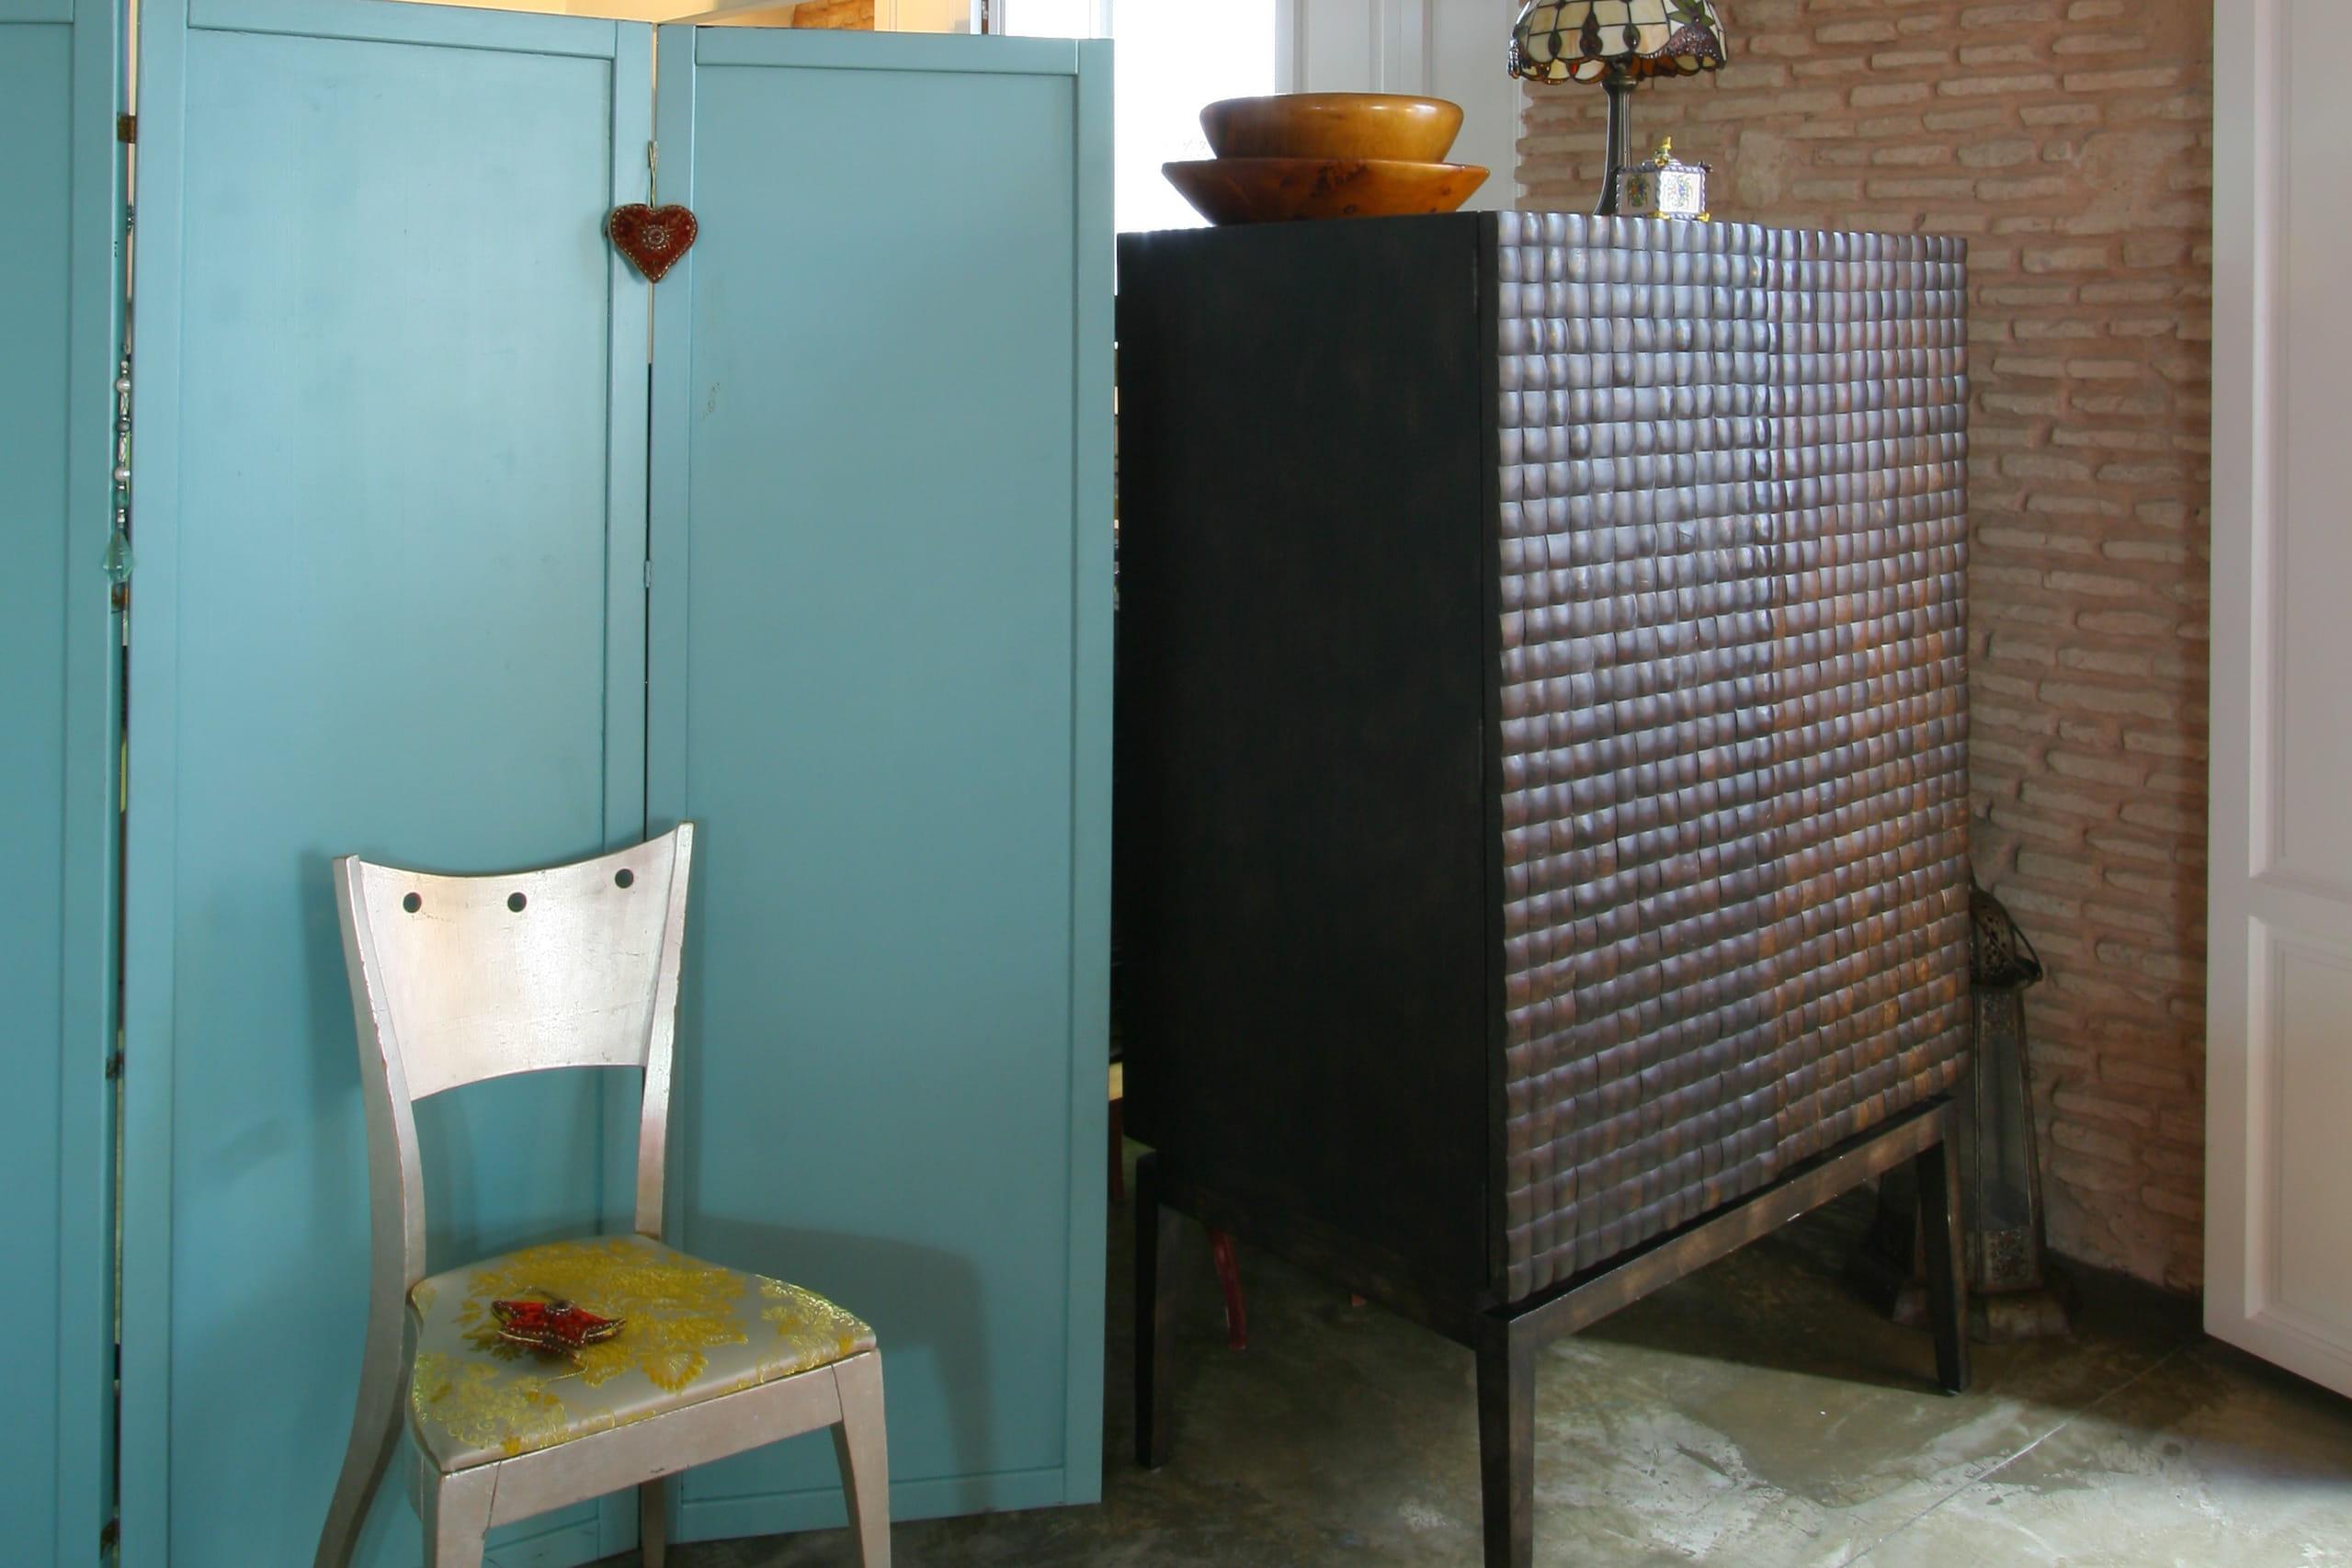 choisir sa d coration couleur bleu lagon journal des femmes. Black Bedroom Furniture Sets. Home Design Ideas